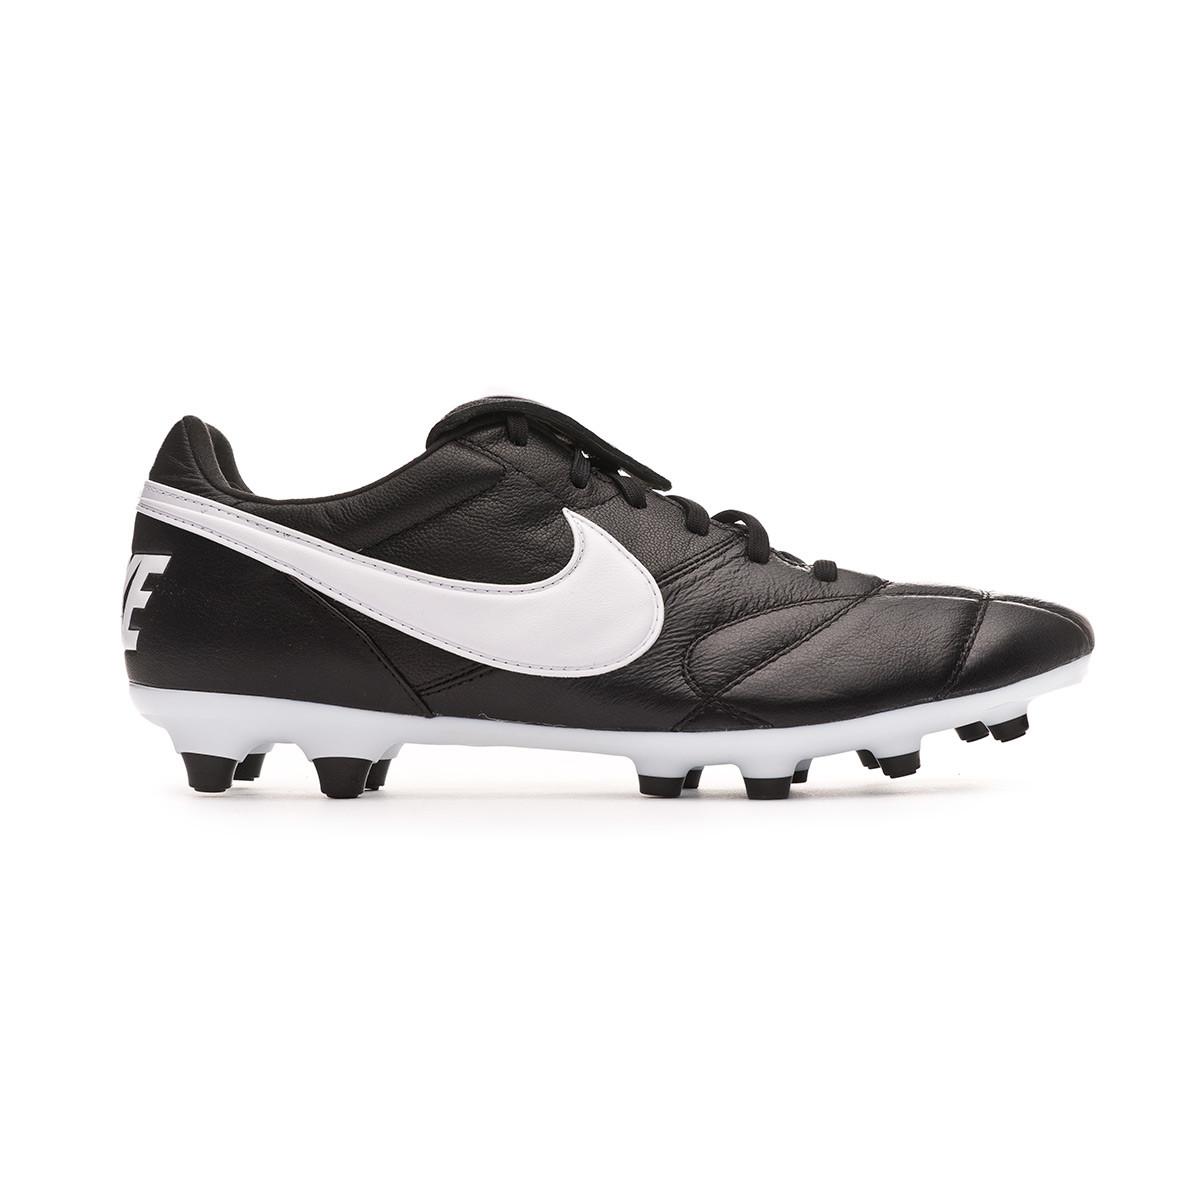 san francisco db77a 7fd22 Chaussure de foot Nike Tiempo Premier II FG Black-White - Boutique de  football Fútbol Emotion